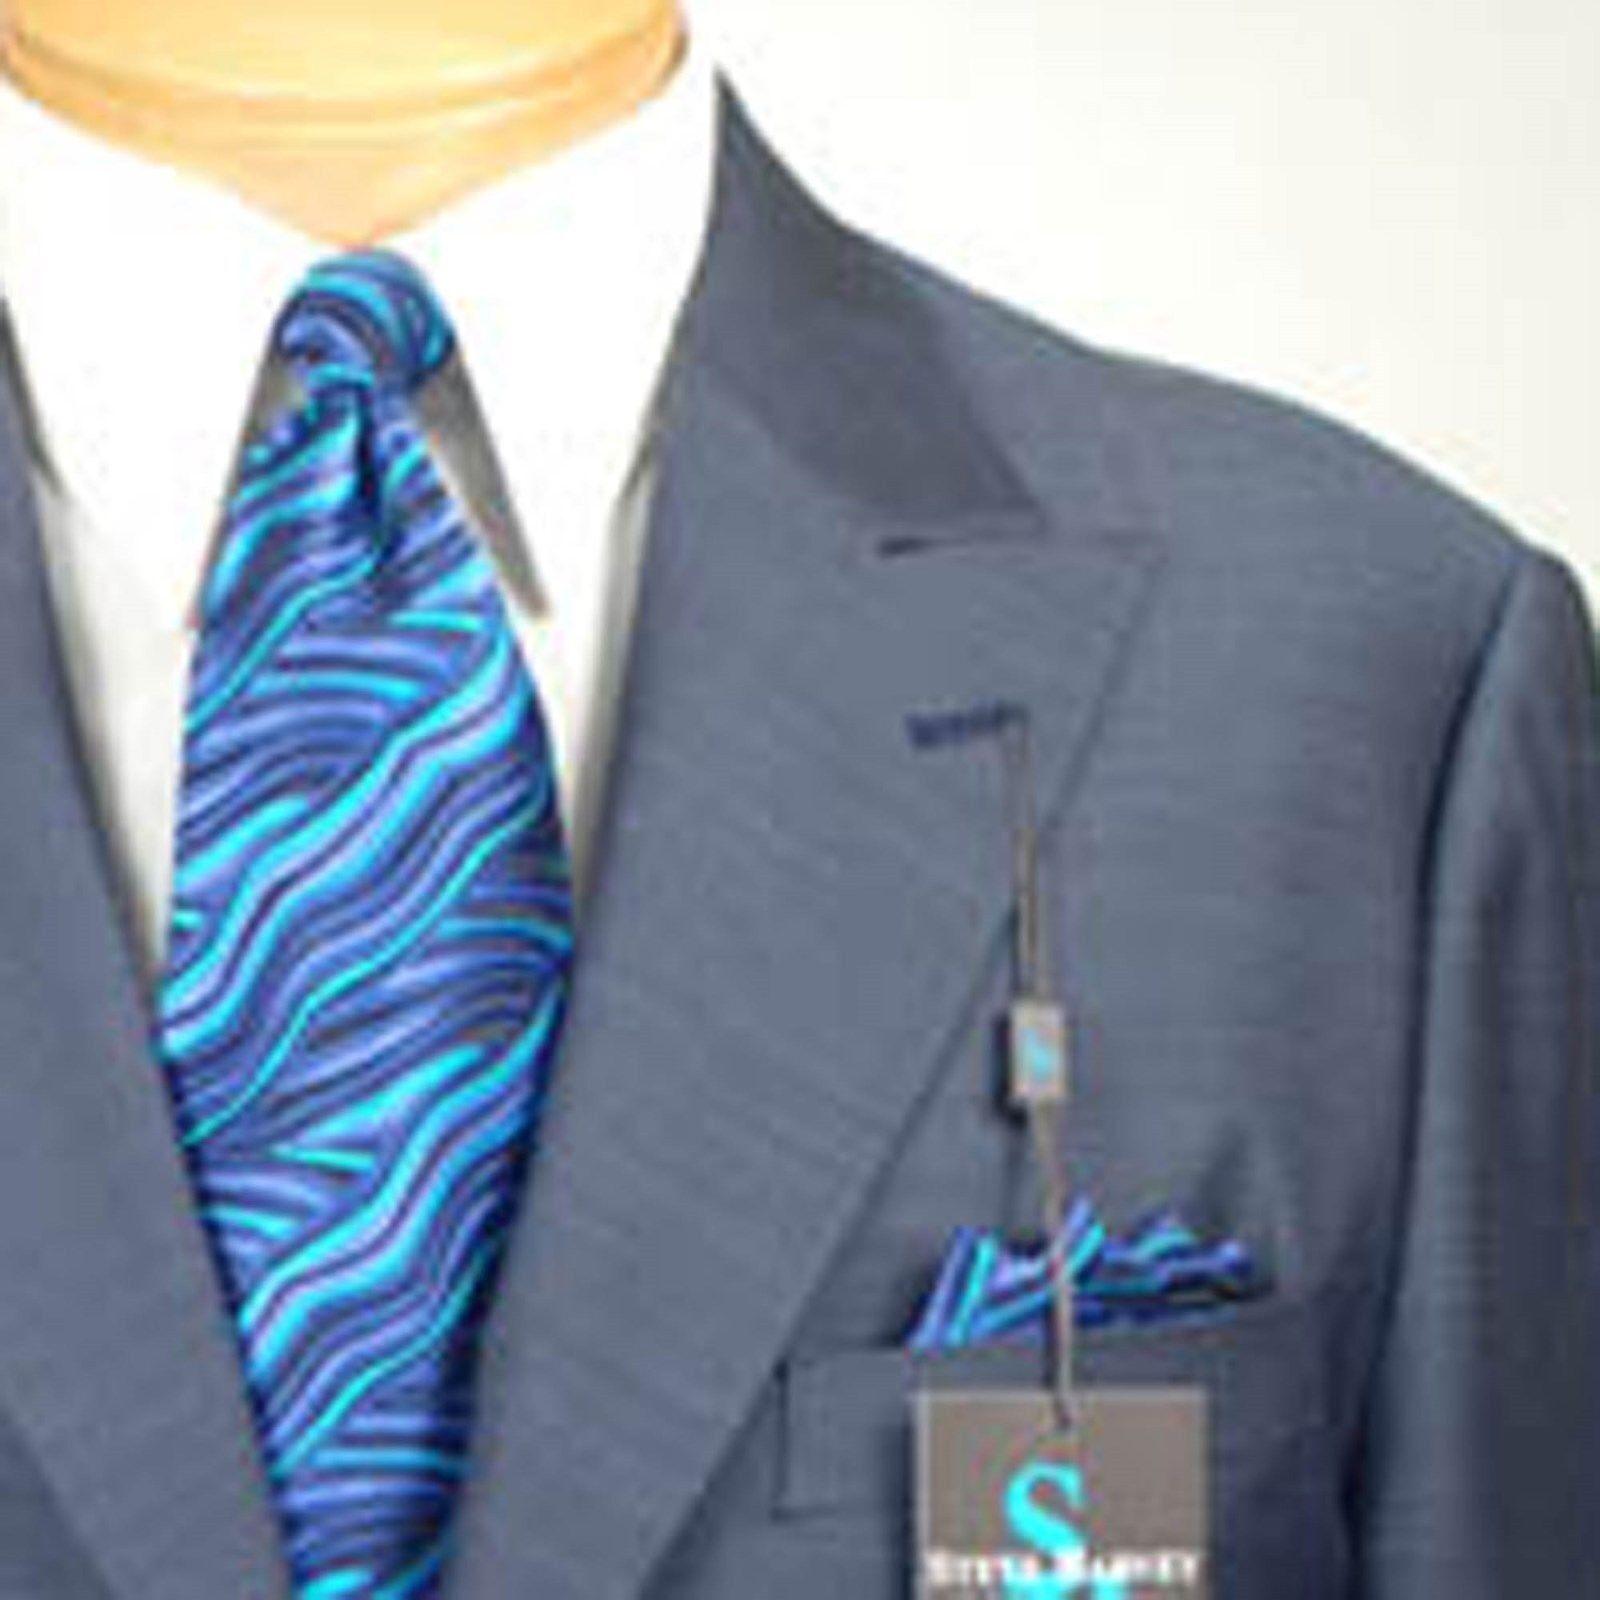 40R STEVE HARVEY  2B Slate bluee SUIT SEPARATE  40 Regular Mens Suits - SS14